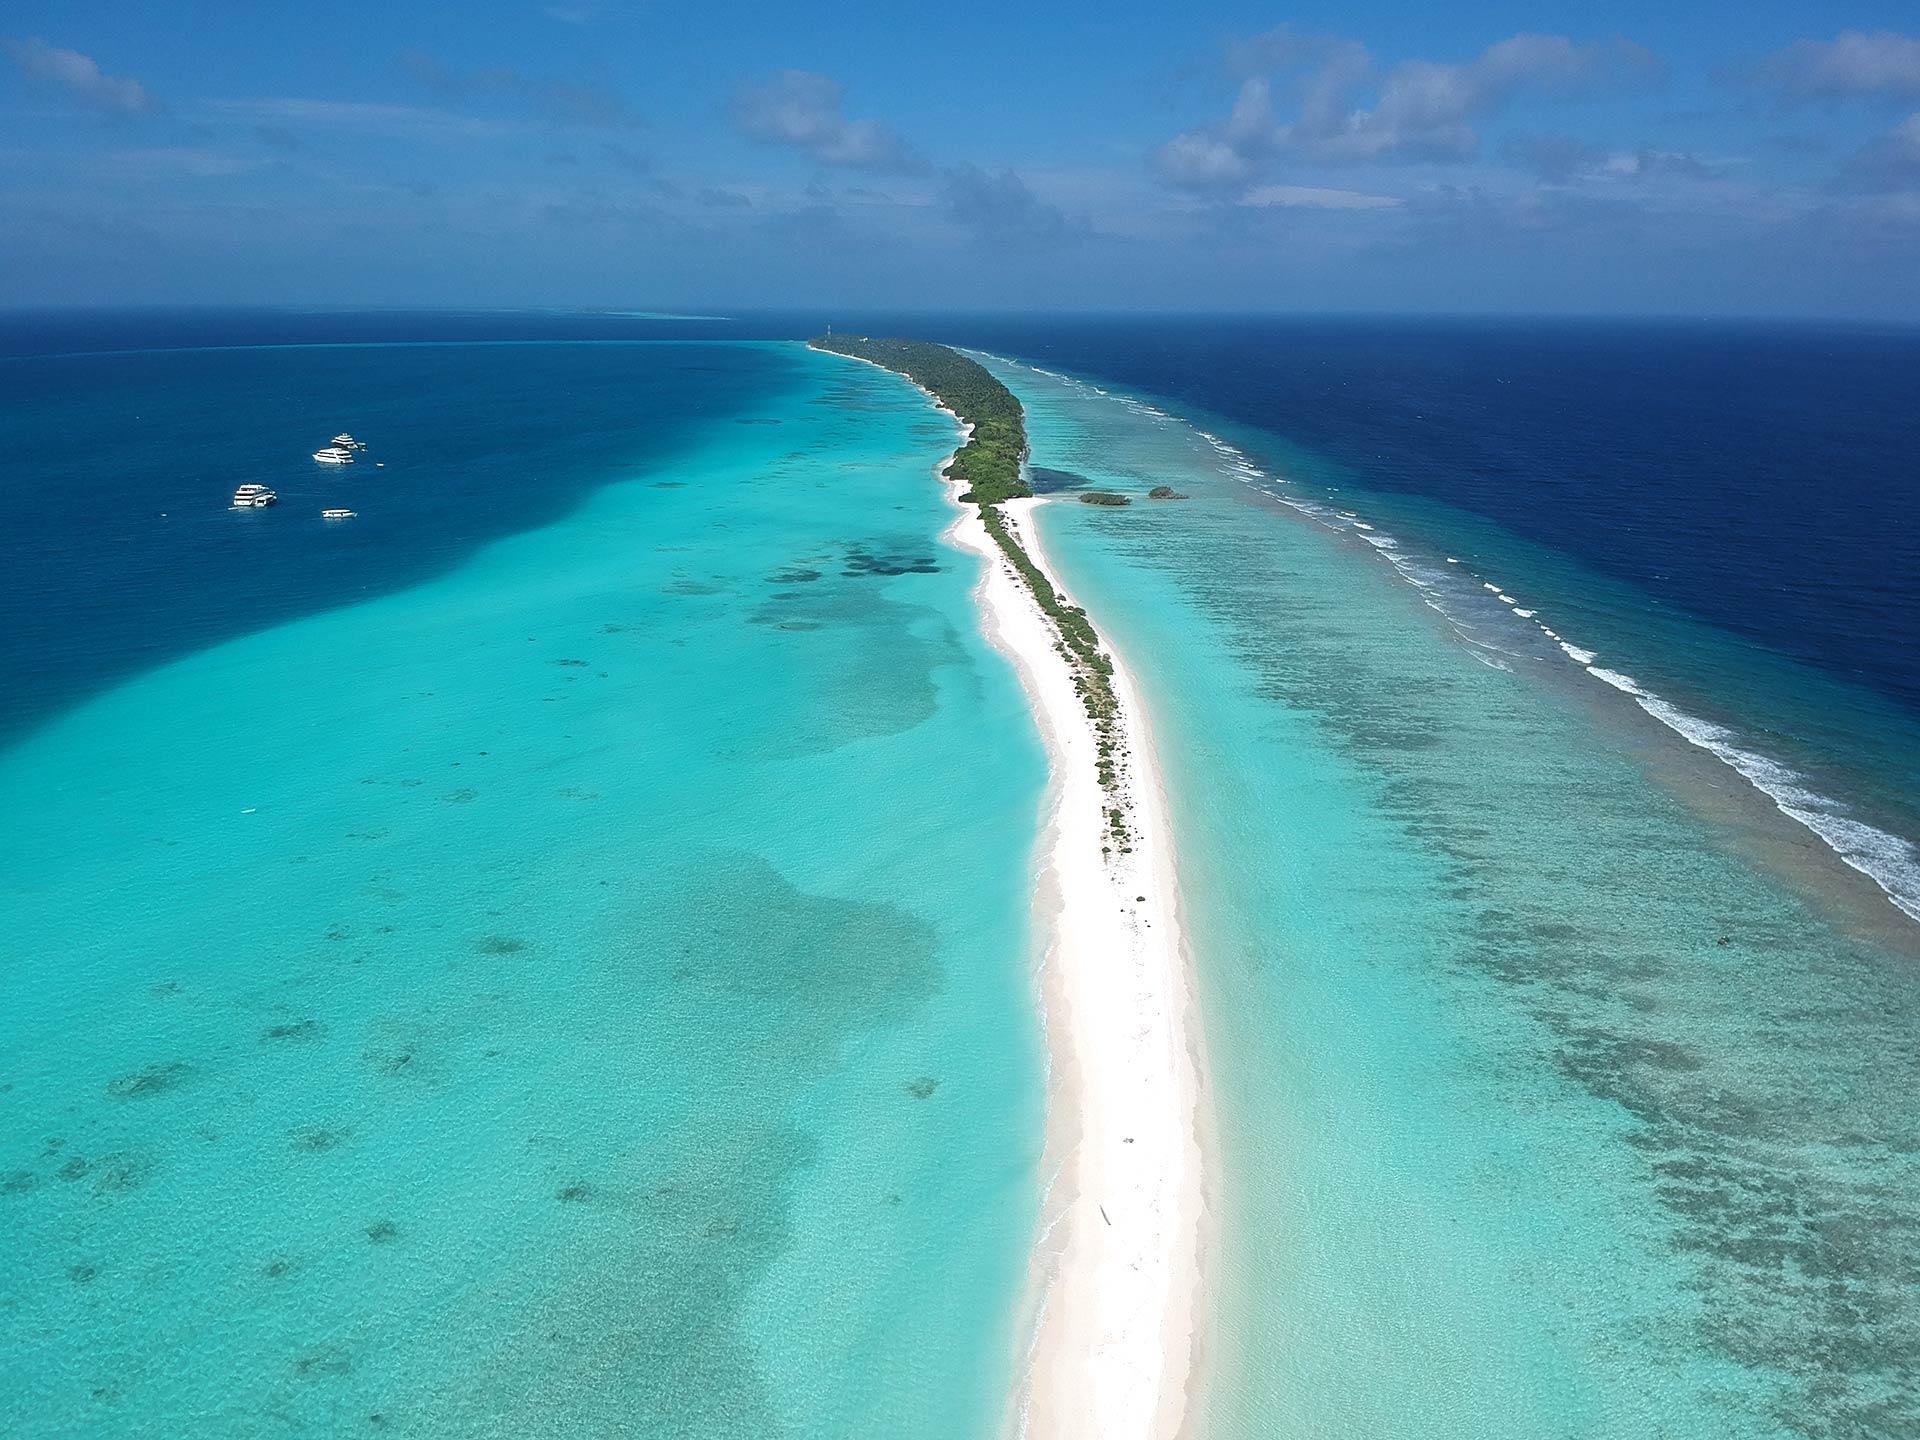 Reabertura das Maldivas